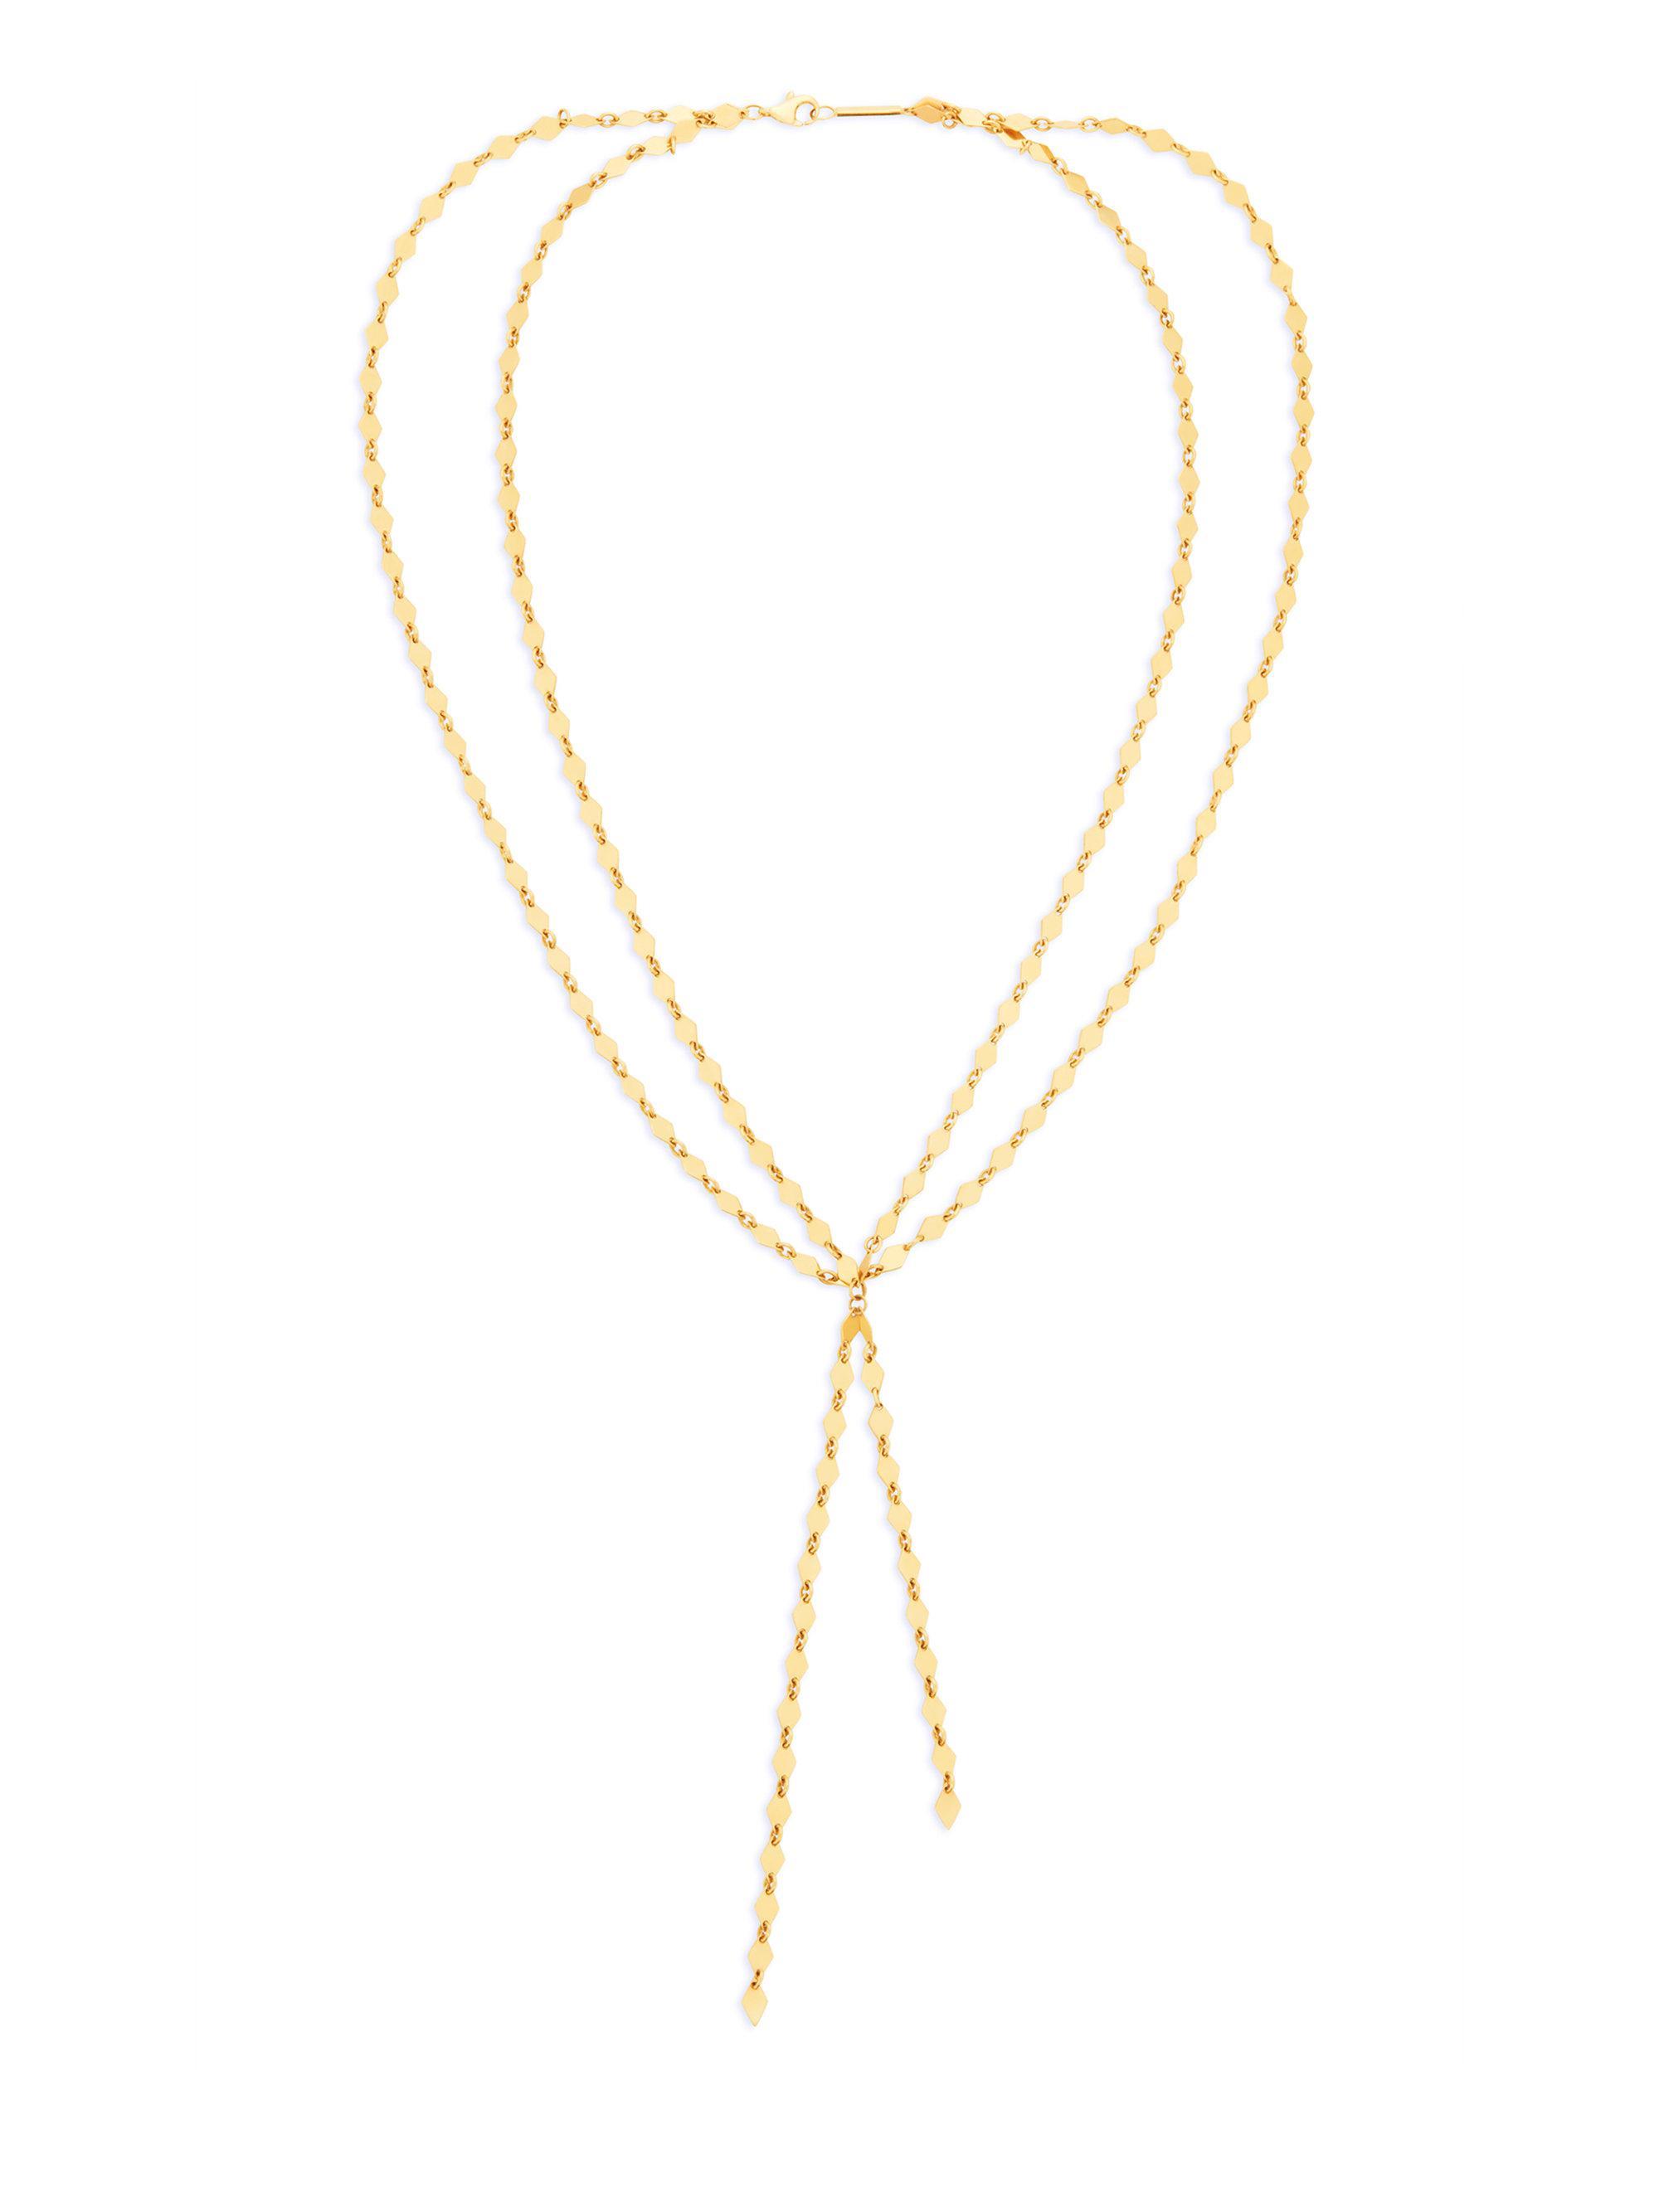 Lana Jewelry 14k Kite Blake Remix Y-Drop Necklace lX0Iup7